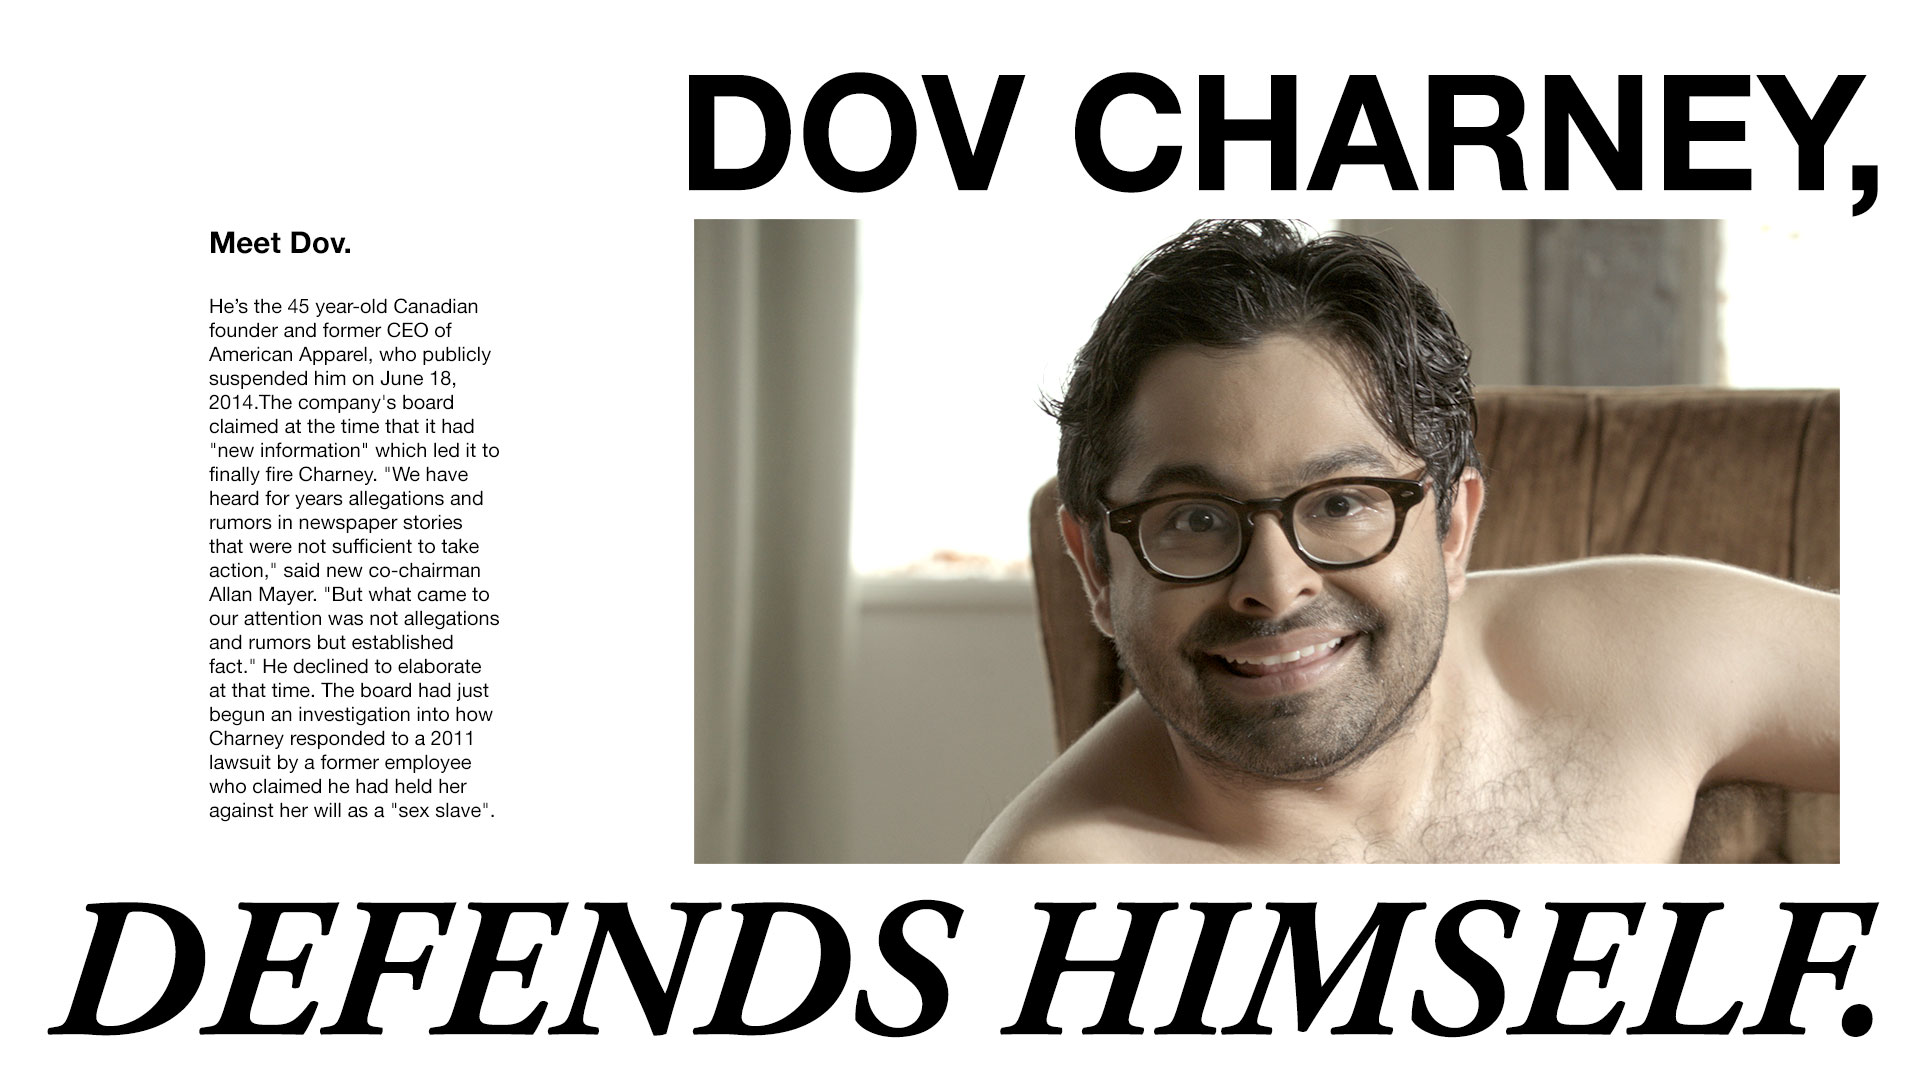 American Apparel's Dov Charney Defends Himself